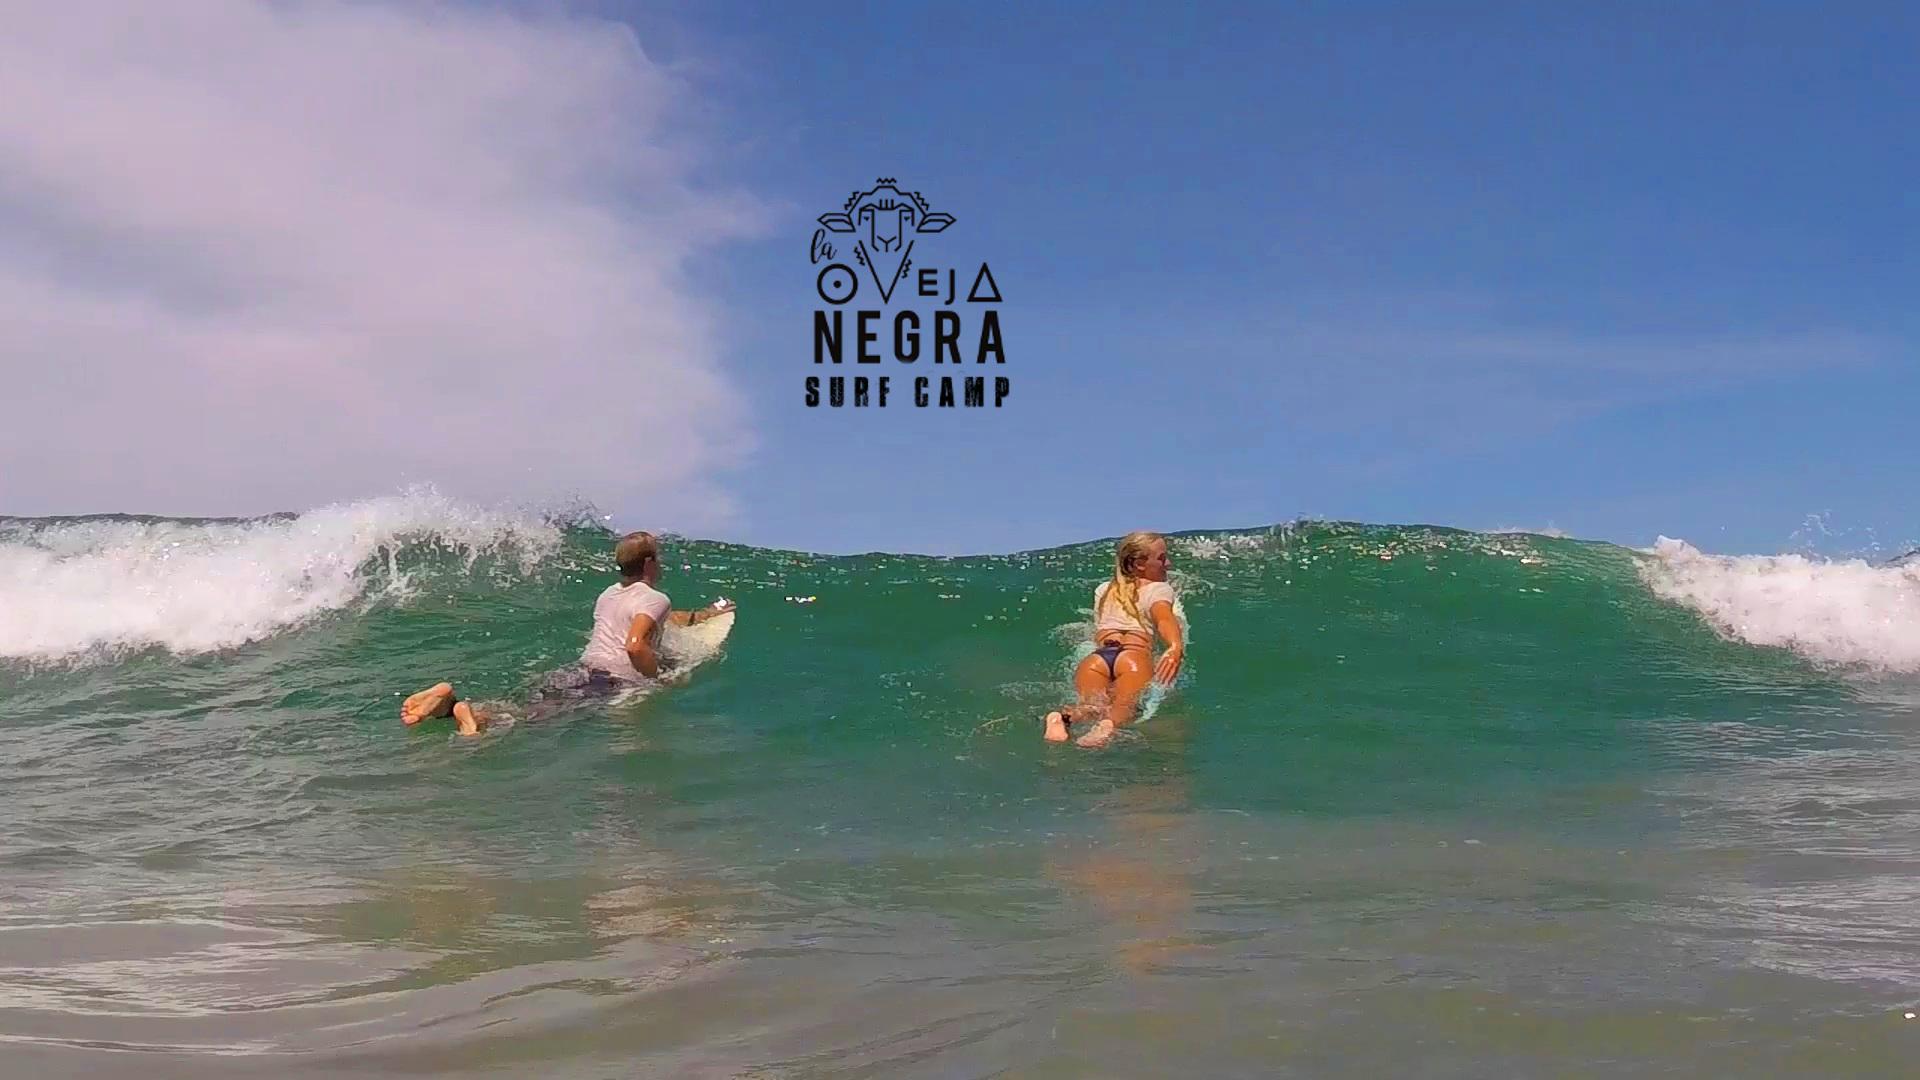 Tamarindo Surf Lesson Camp Costa Rica - La Oveja Negra 11